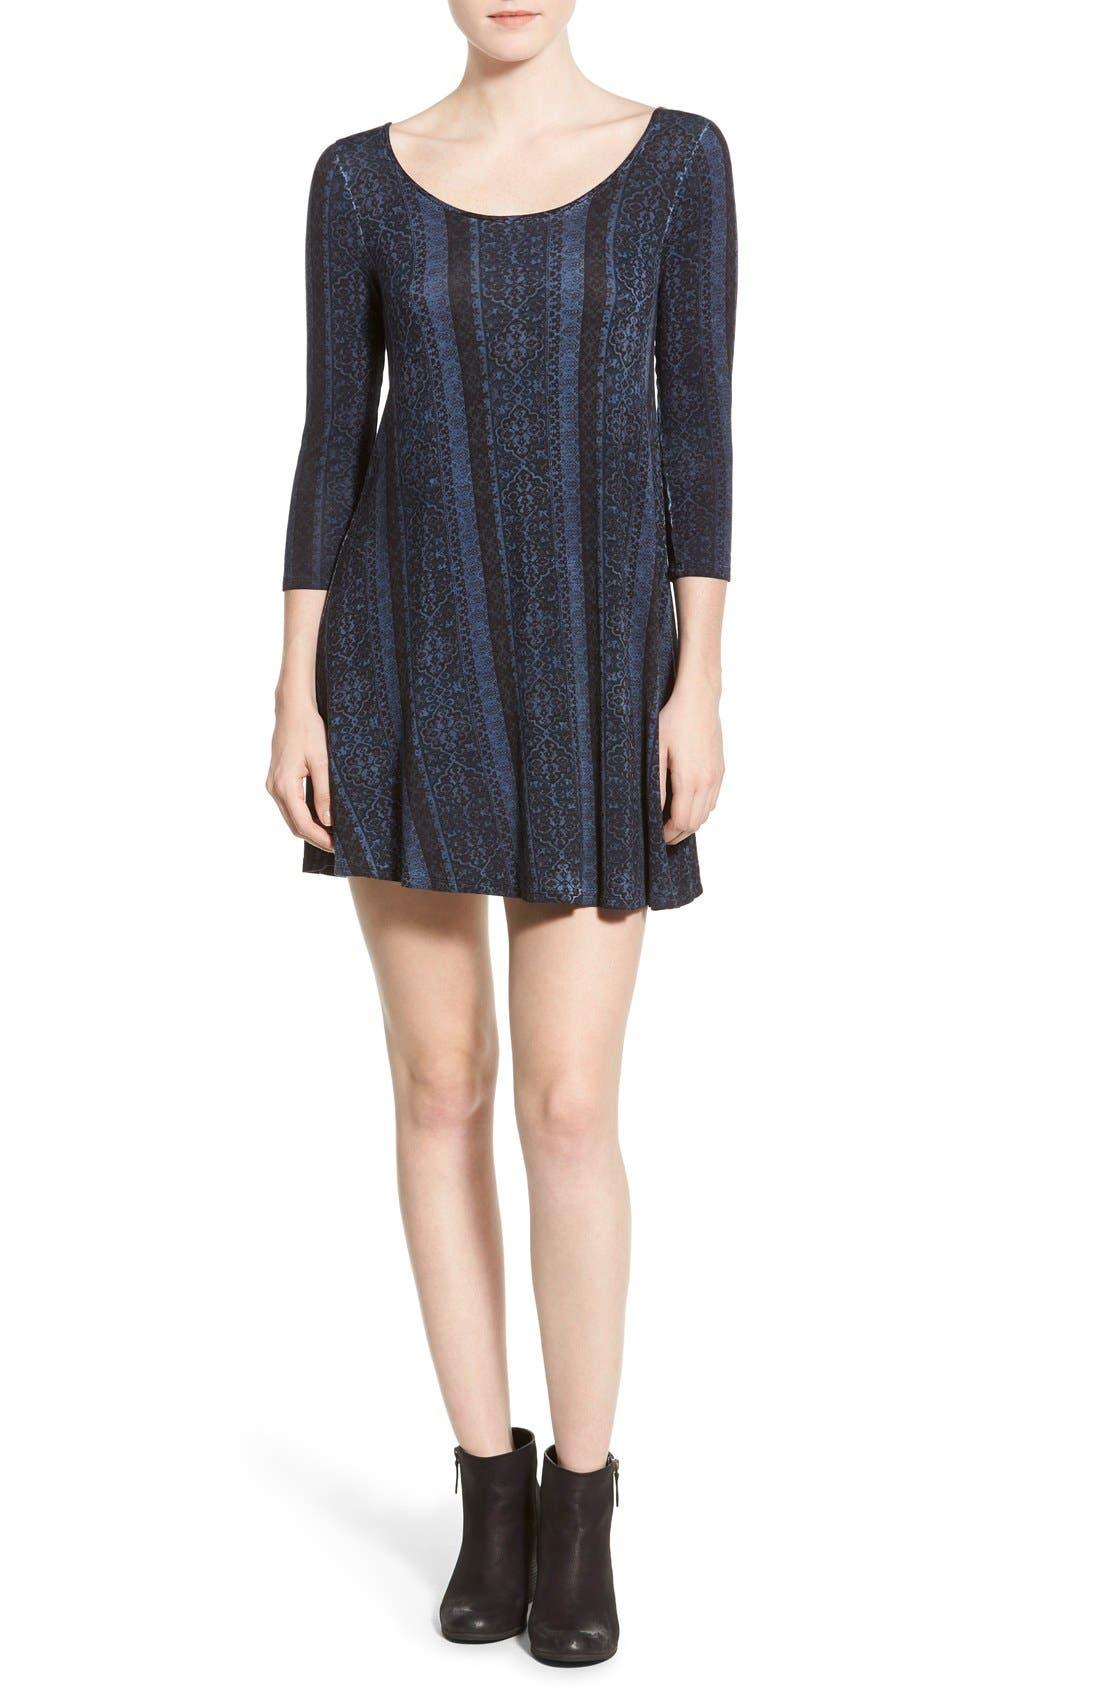 Alternate Image 1 Selected - Socialite Print Cross Back Knit Dress